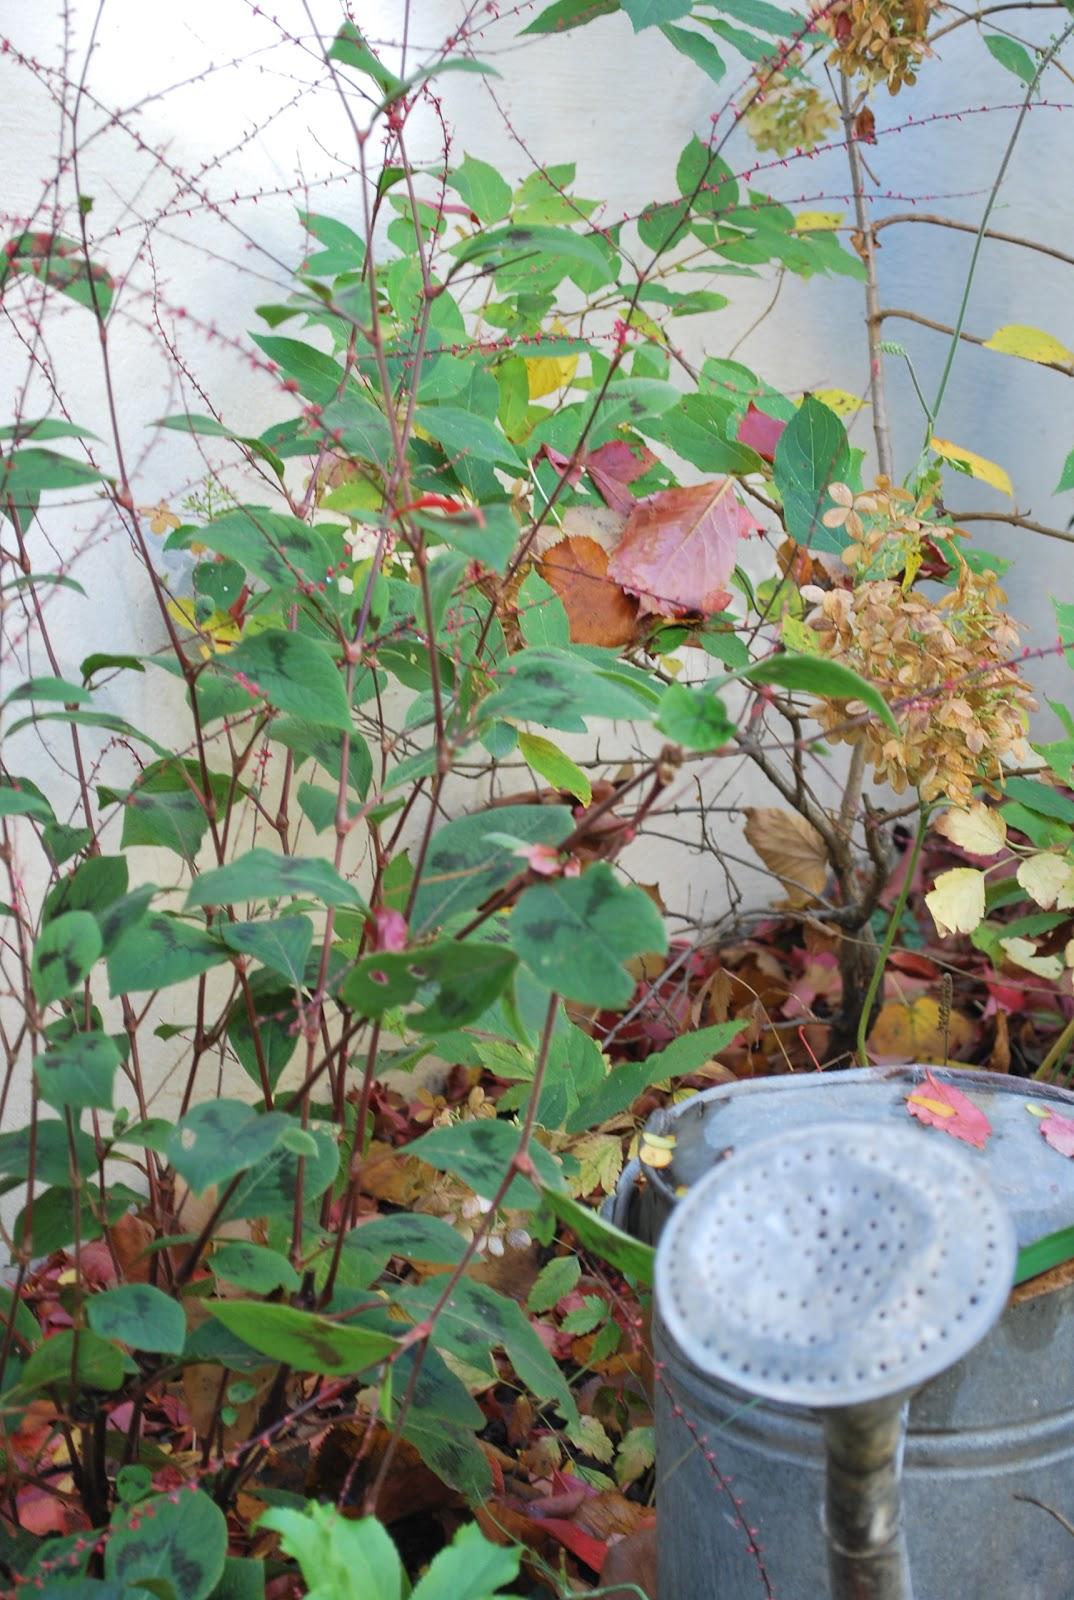 Lavori d autunno in giardino giardino metropolitano - Lavori in giardino ...